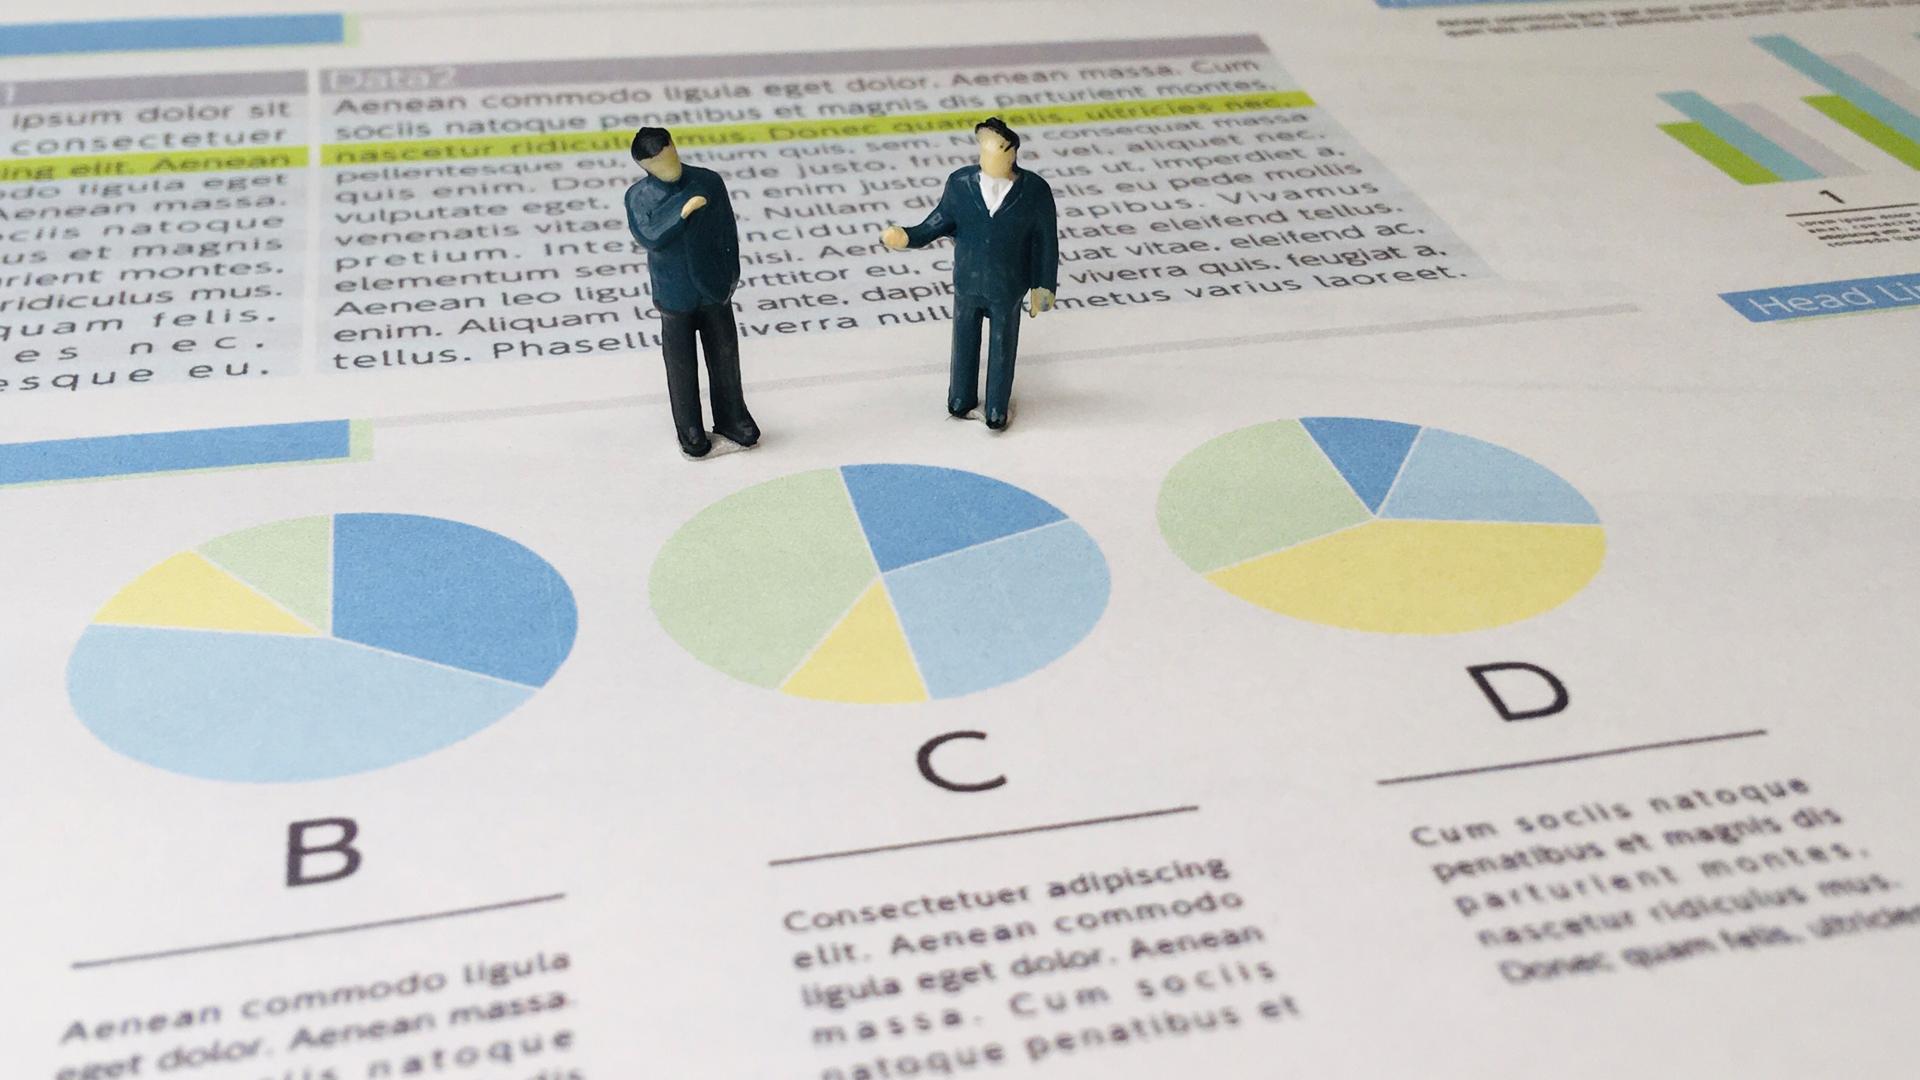 ecサイト 売上 分析,ecサイト コンサル 分析